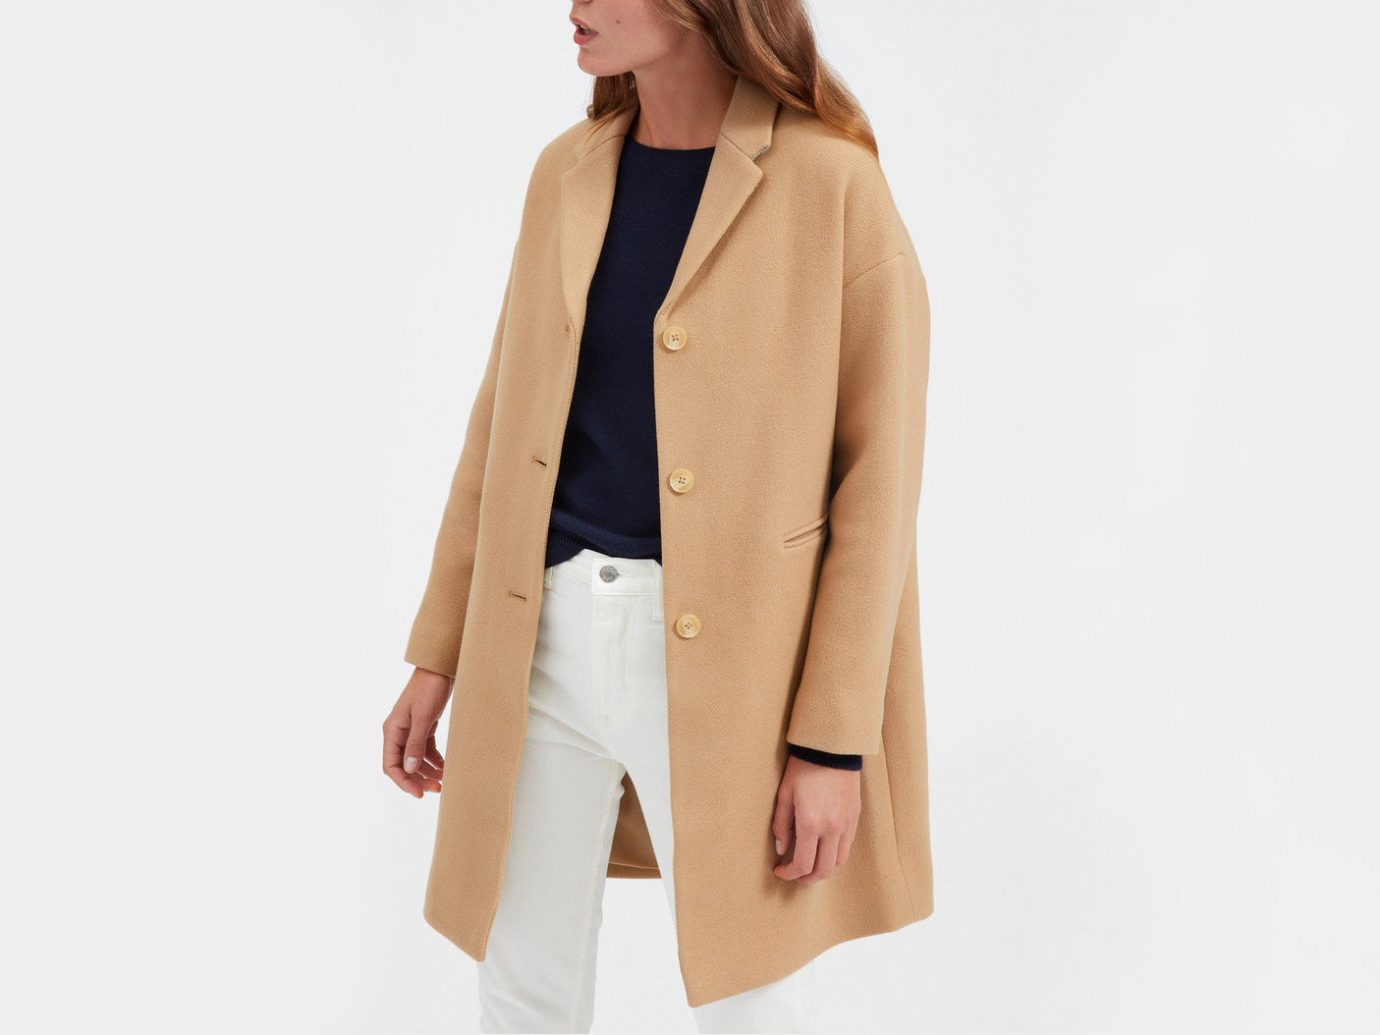 Style + Design Travel Shop clothing person coat suit fashion model outerwear beige overcoat neck blazer posing dressed